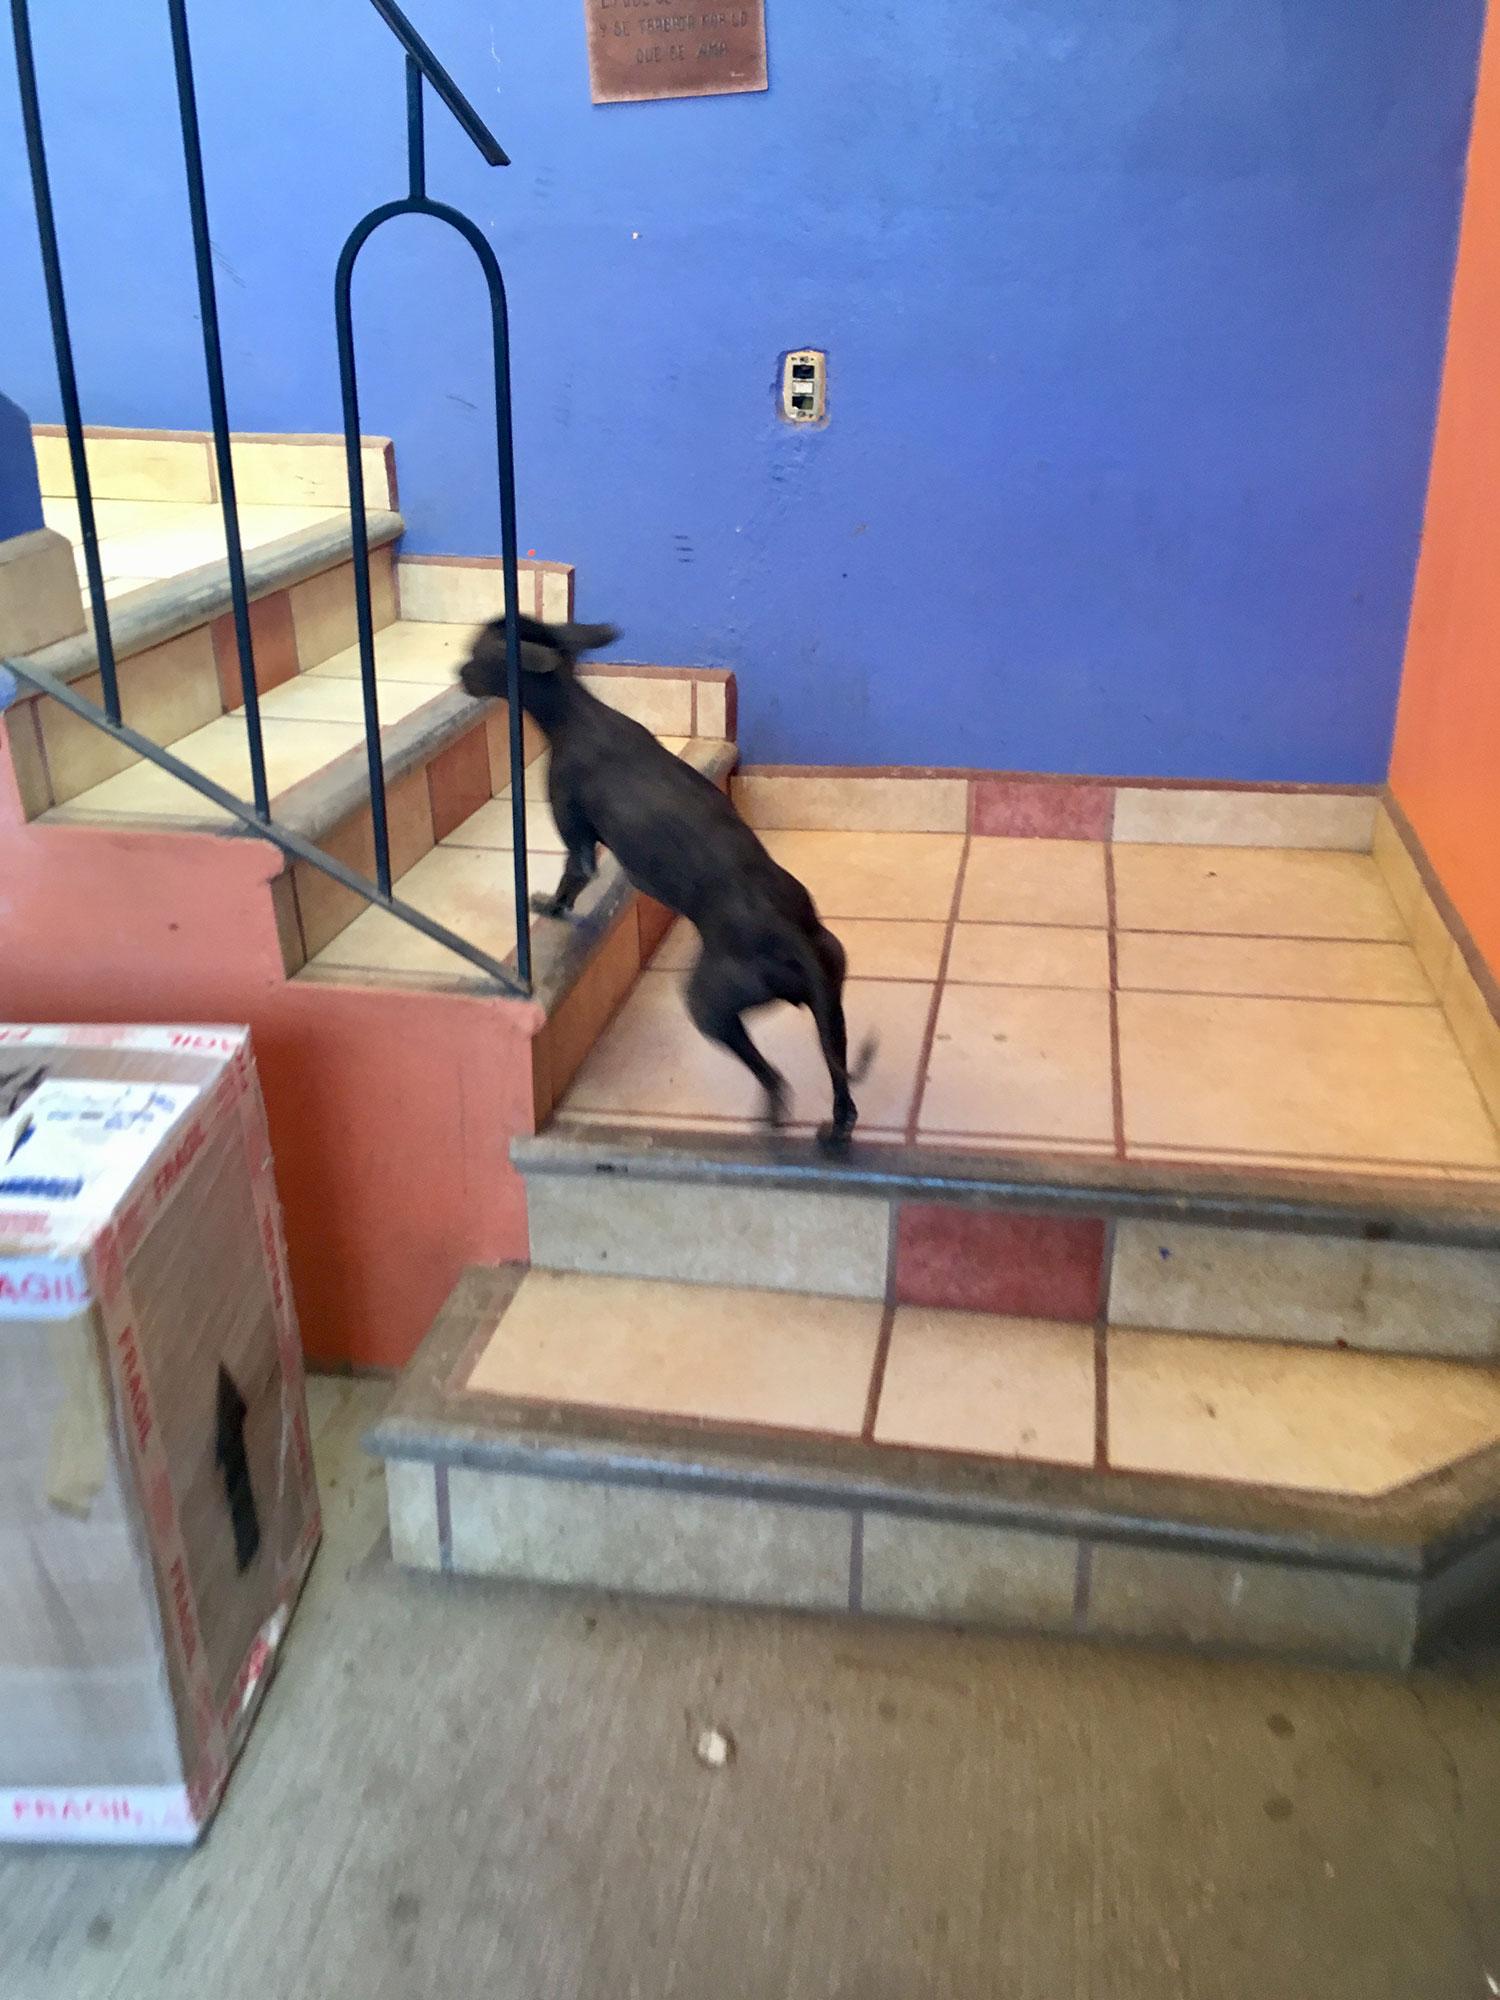 María's dog Dante.